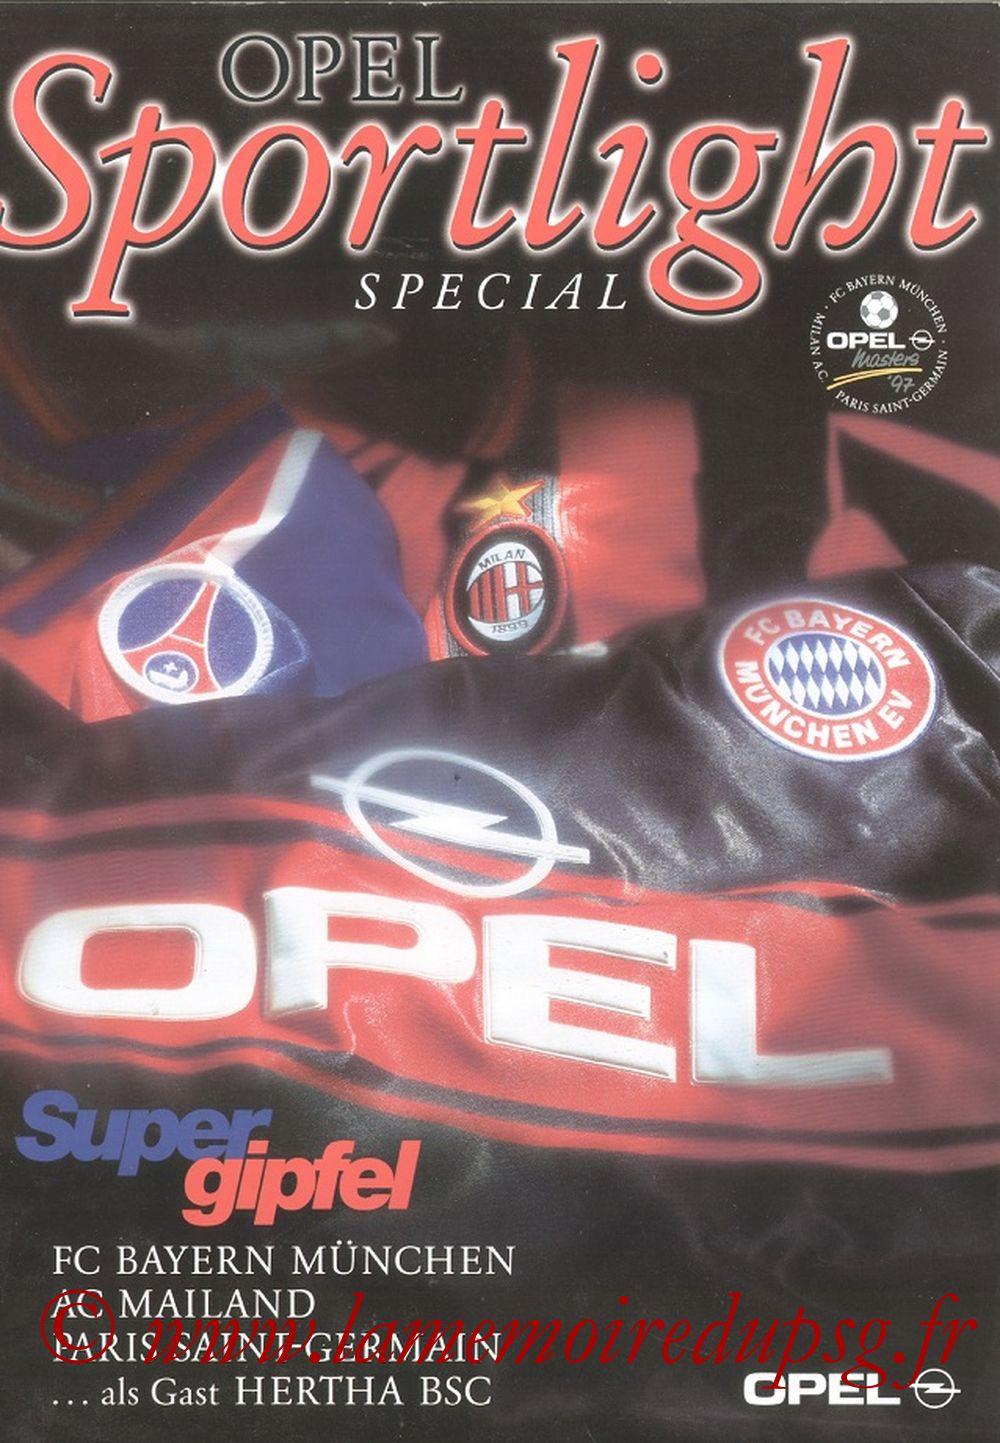 1997-07-28  Opel Master à Berlin (Programme officiel)